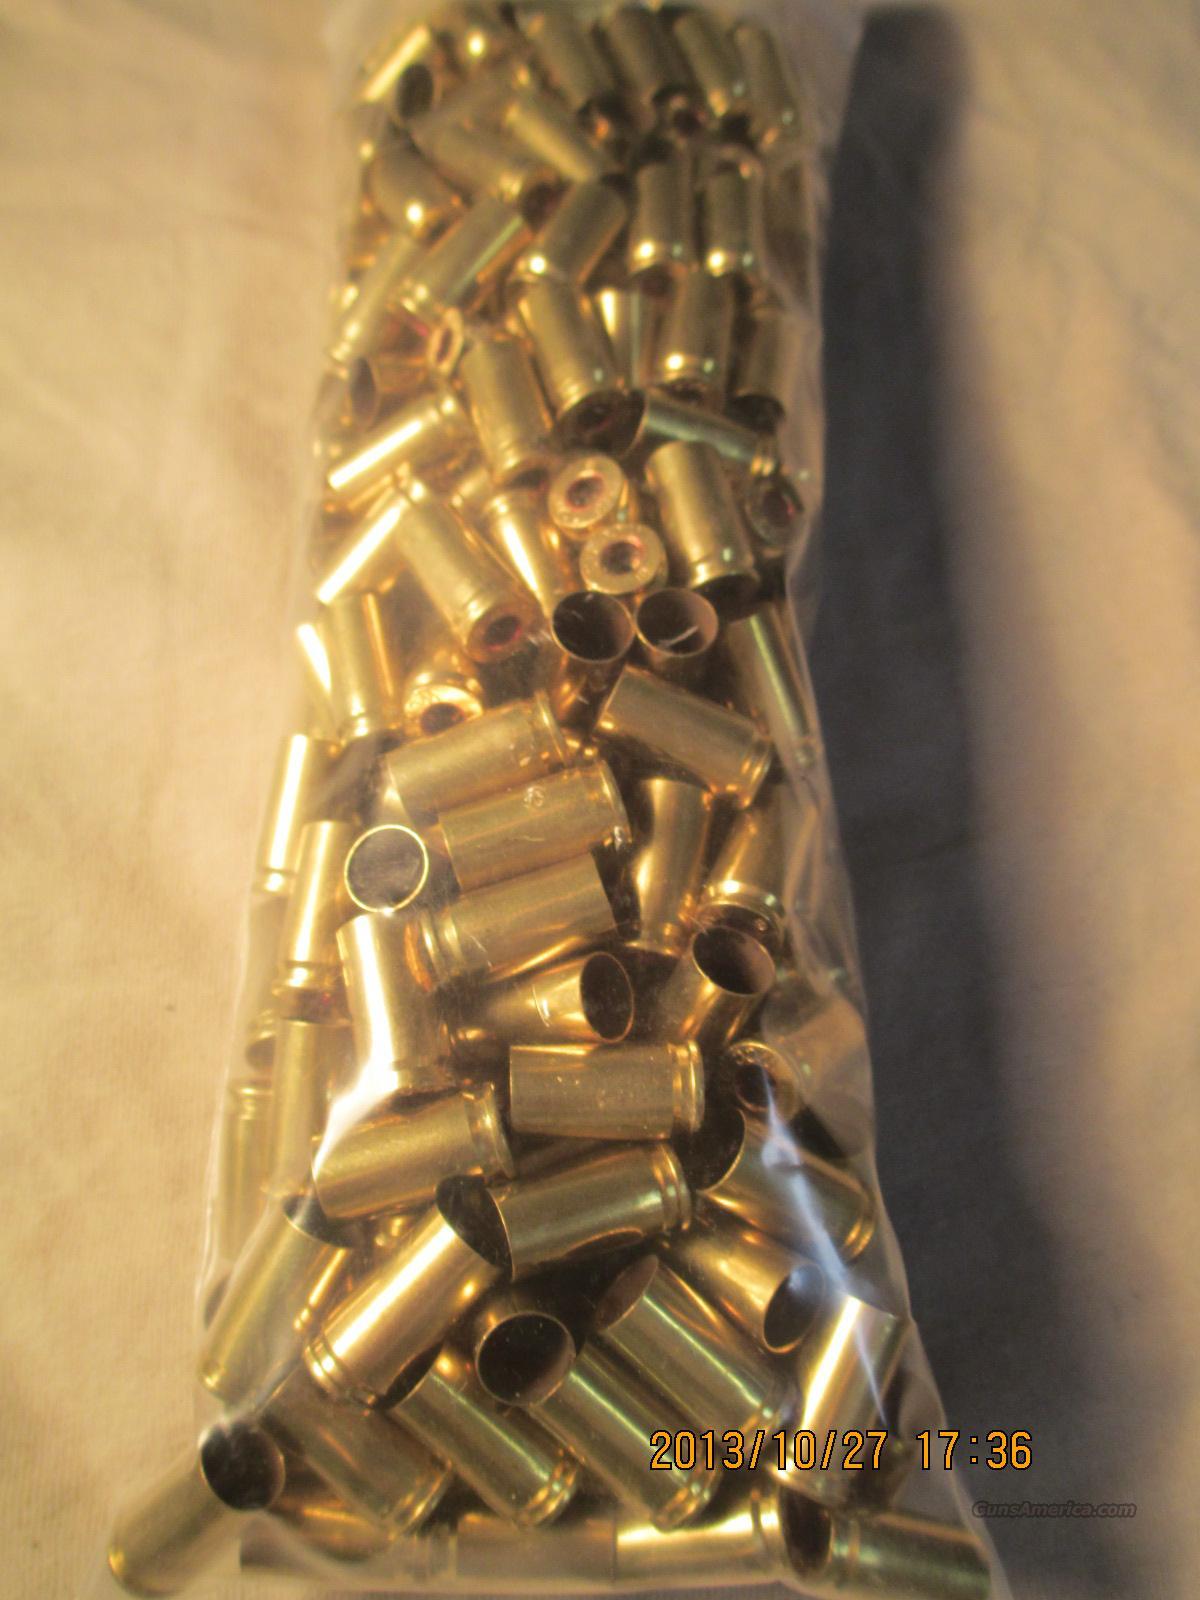 9MM WCCNATO 95 BRASS  Non-Guns > Reloading > Components > Brass